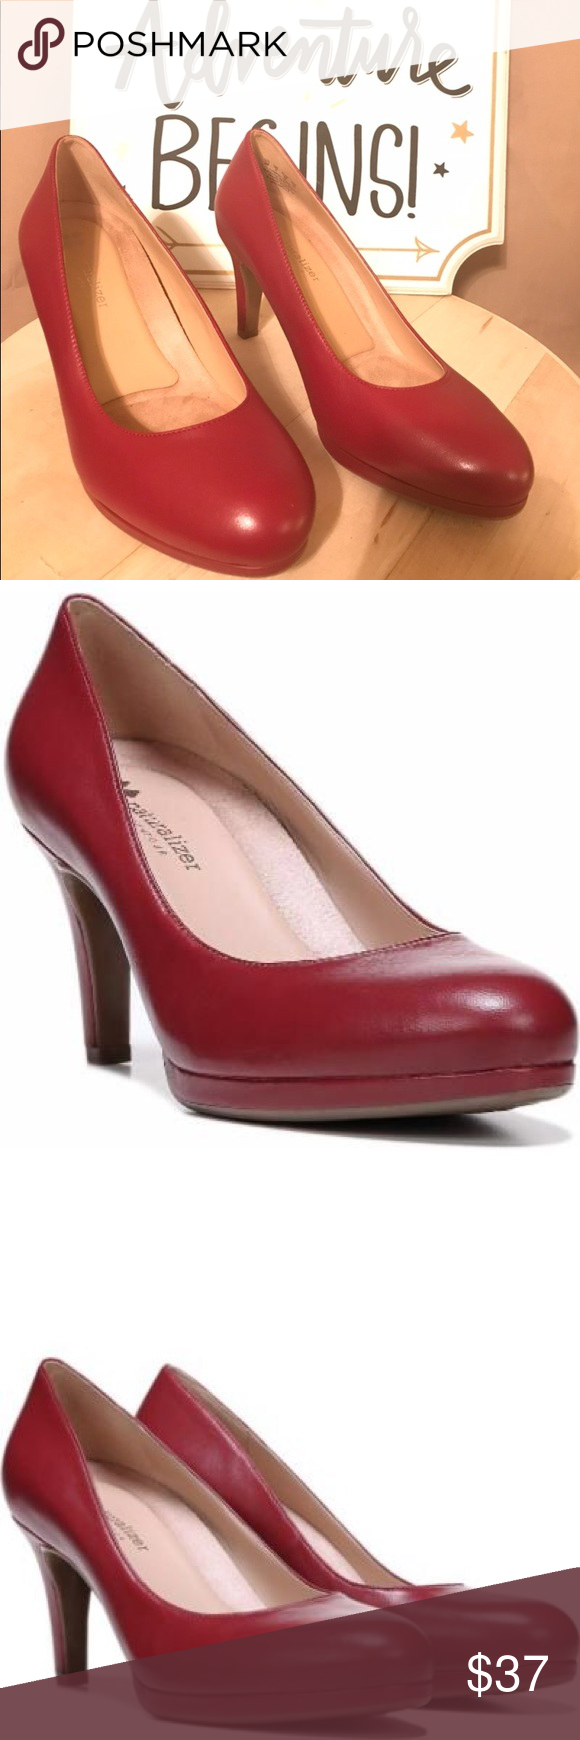 de0f4290df9 Naturalizer Red Platform Mid Heel Pumps 👠👠 Naturalizer